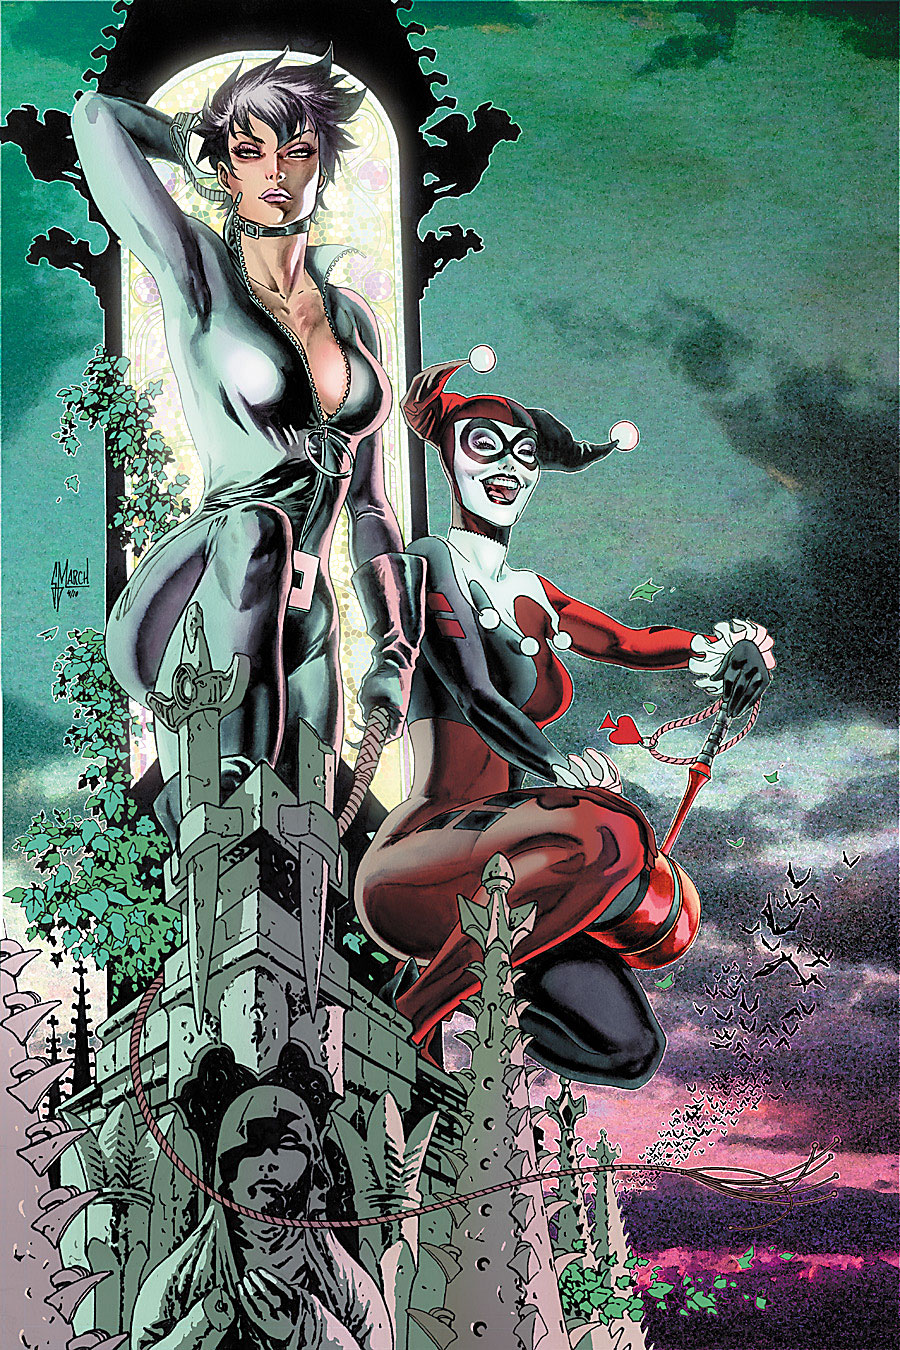 Gotham City Sirens Vol 1 12 Textless.jpg